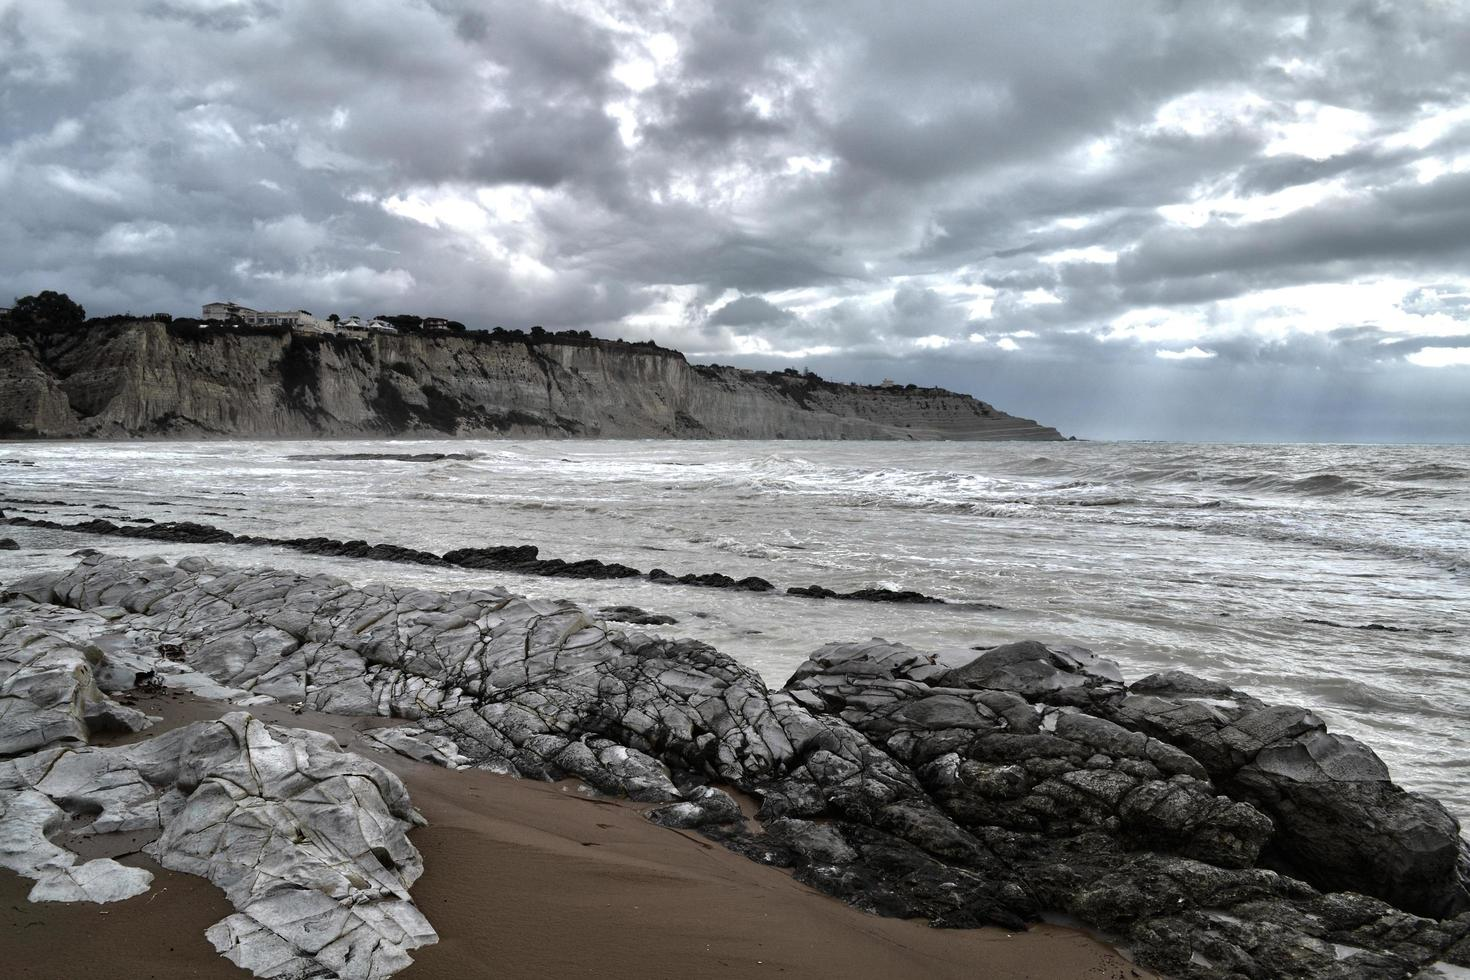 rocas grises cerca del mar bajo un cielo gris foto